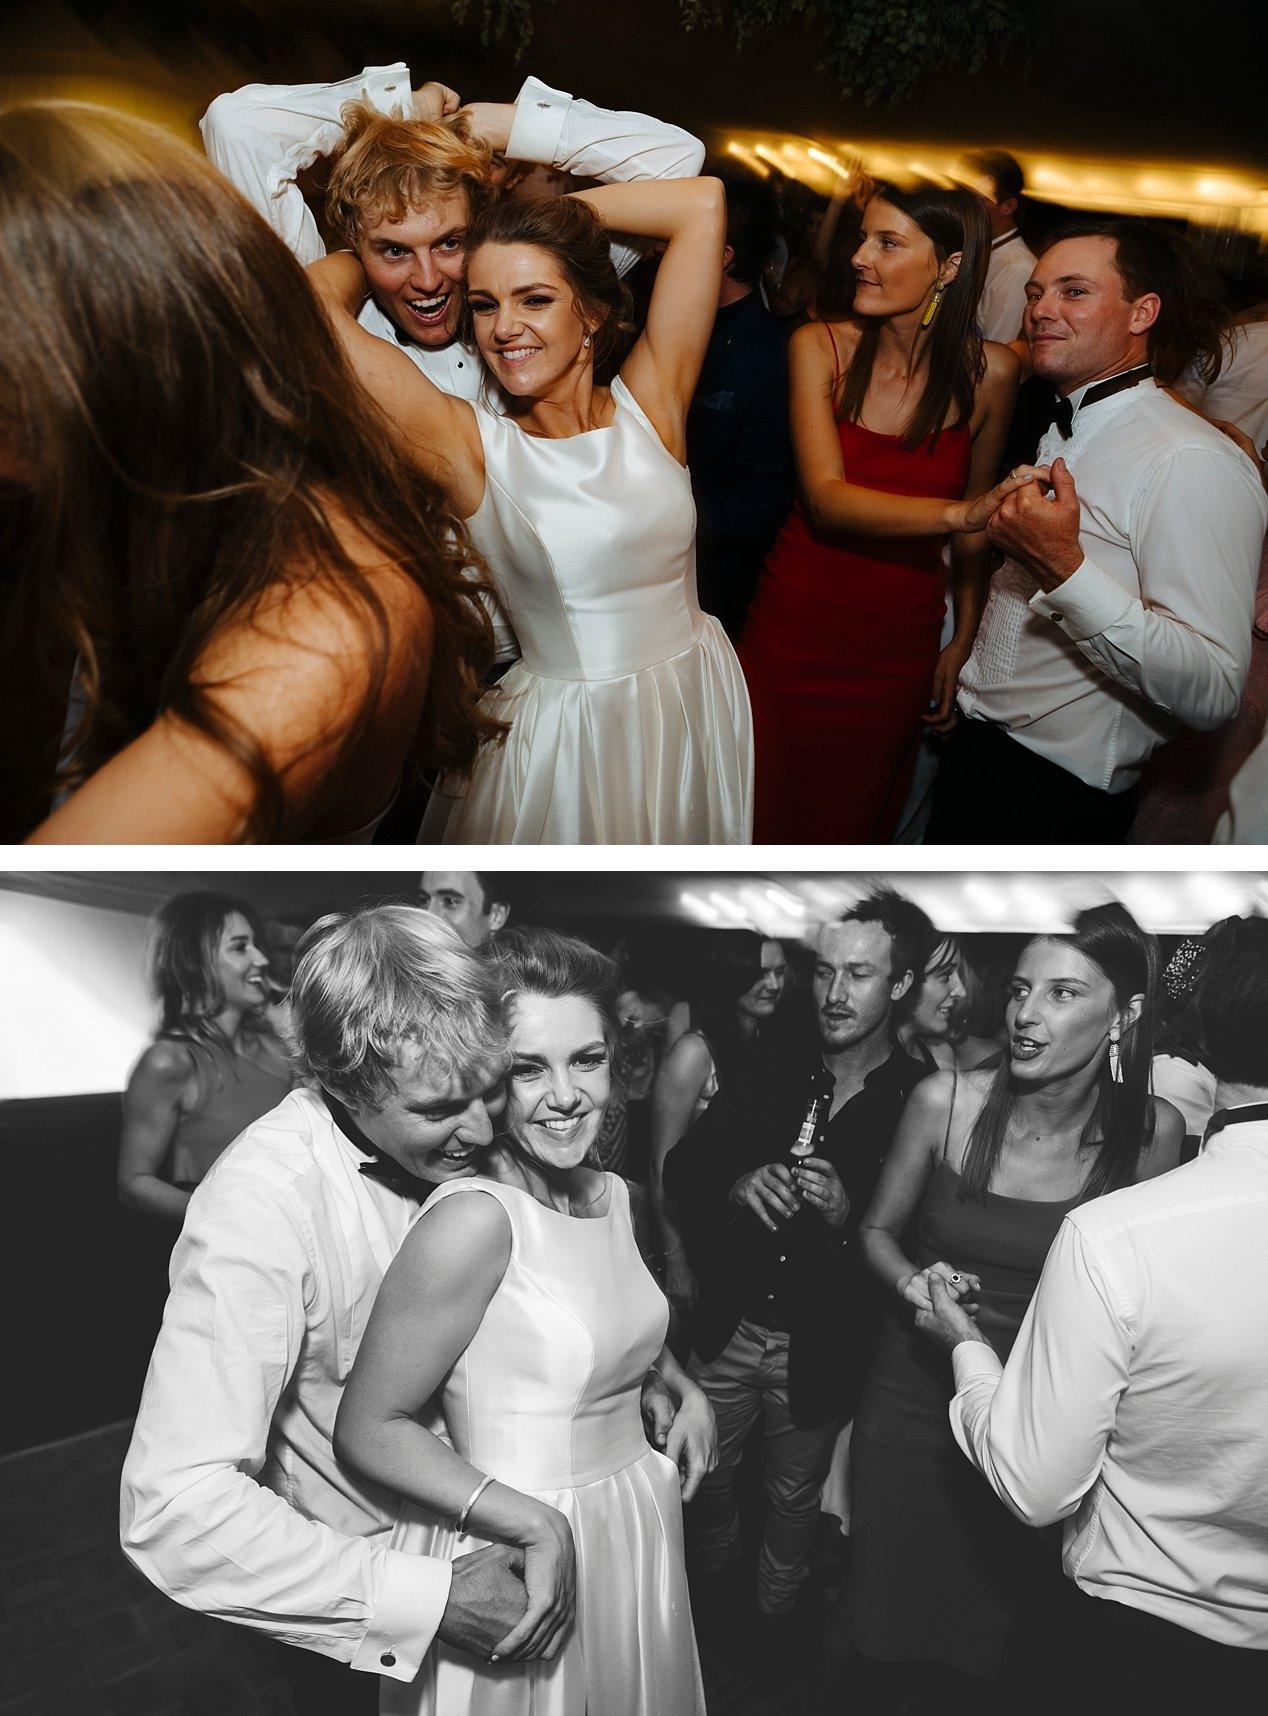 Deniliquin Jerilderie Wagga Wagga Wedding Photographer_The Crossing Deniliquin party caterers Deniliquin10